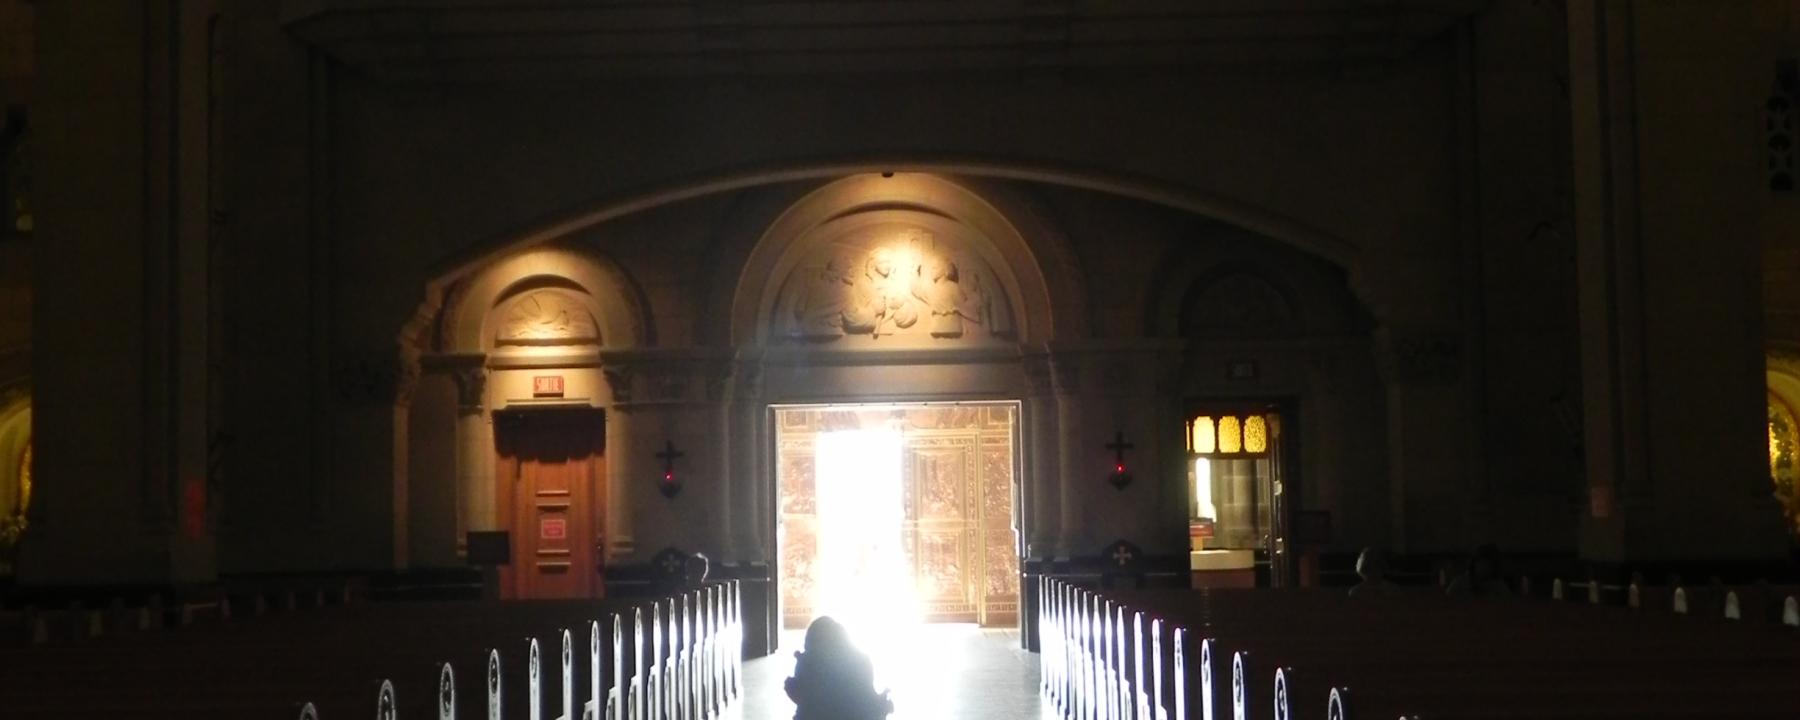 Church, holy, Christina Chase, Ste. Anne-de-Beaupré